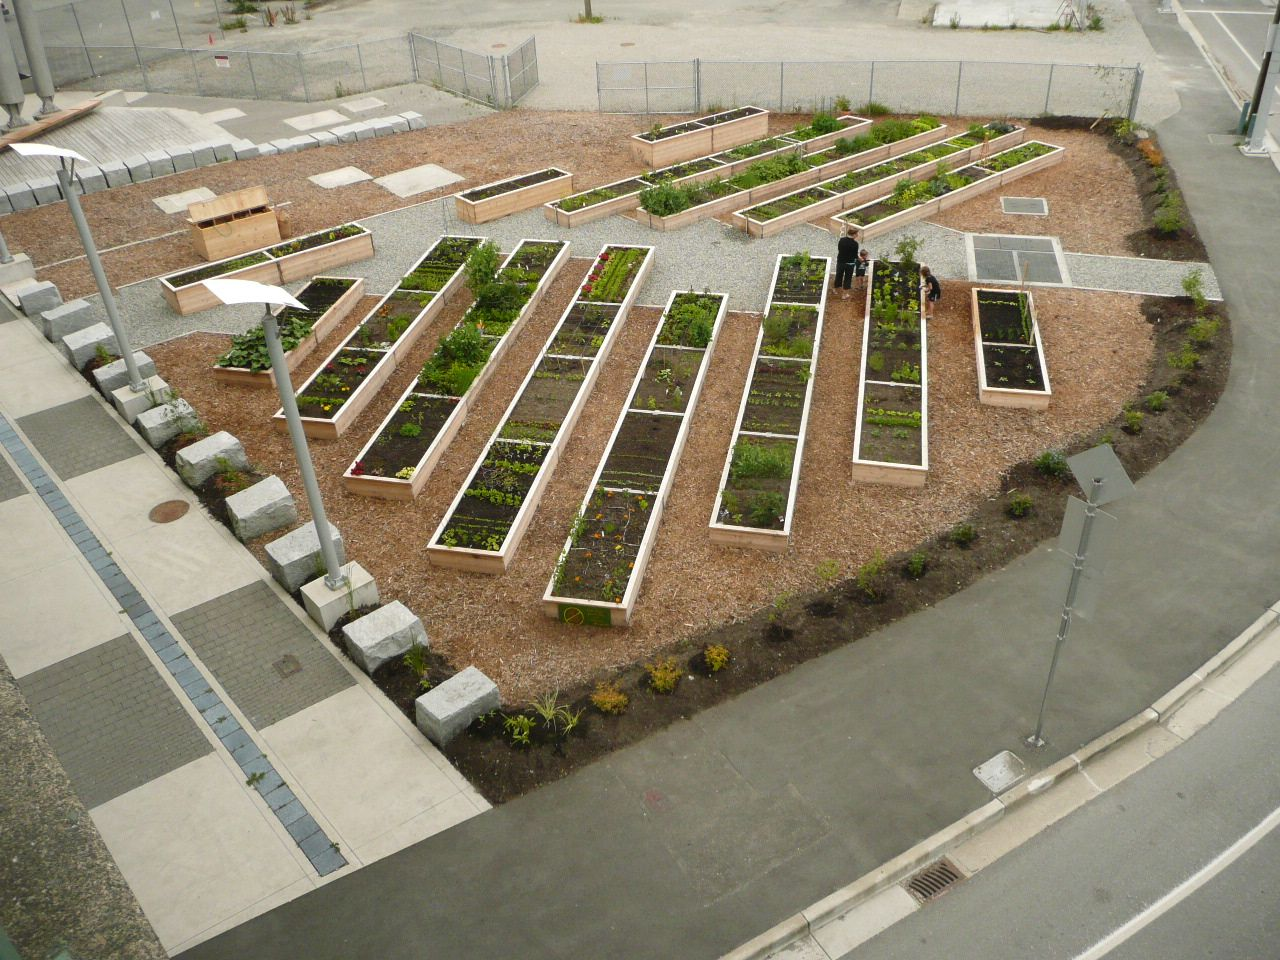 community garden layout - Google Search | Community ...